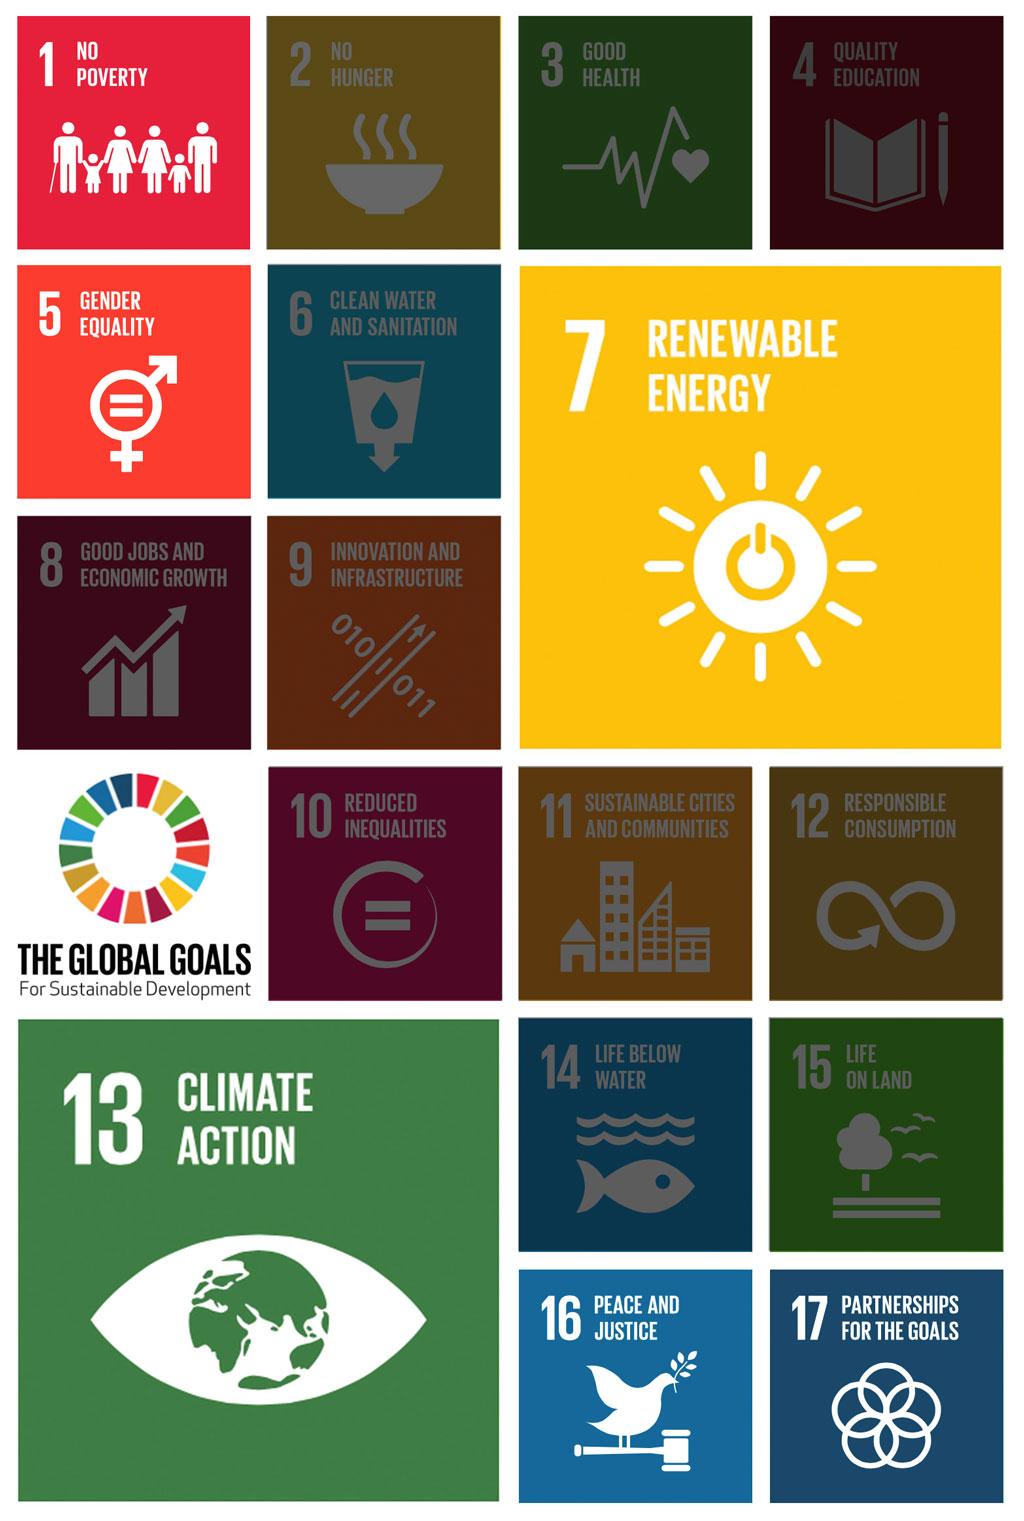 un_development_goals_sustainable_energy